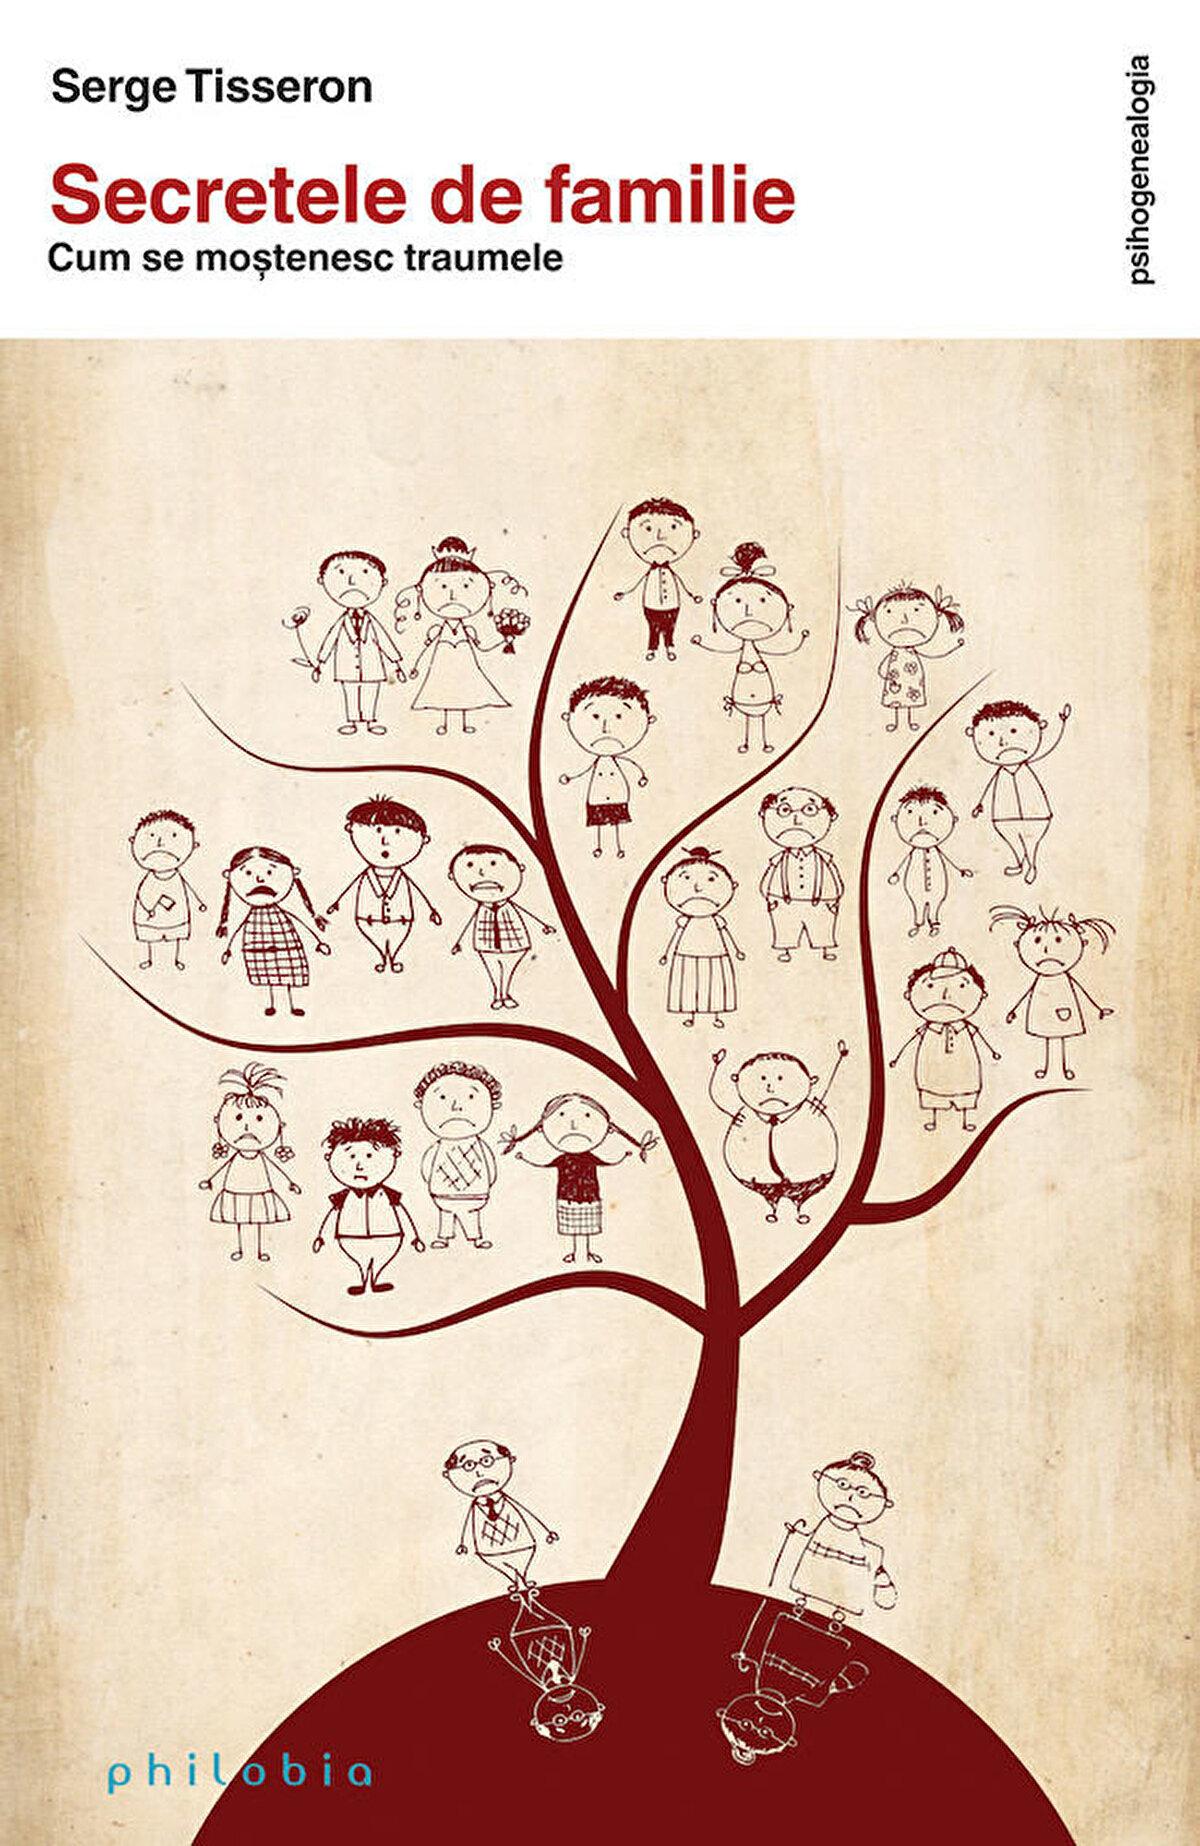 Secretele de familie. Cum se mostenesc traumele